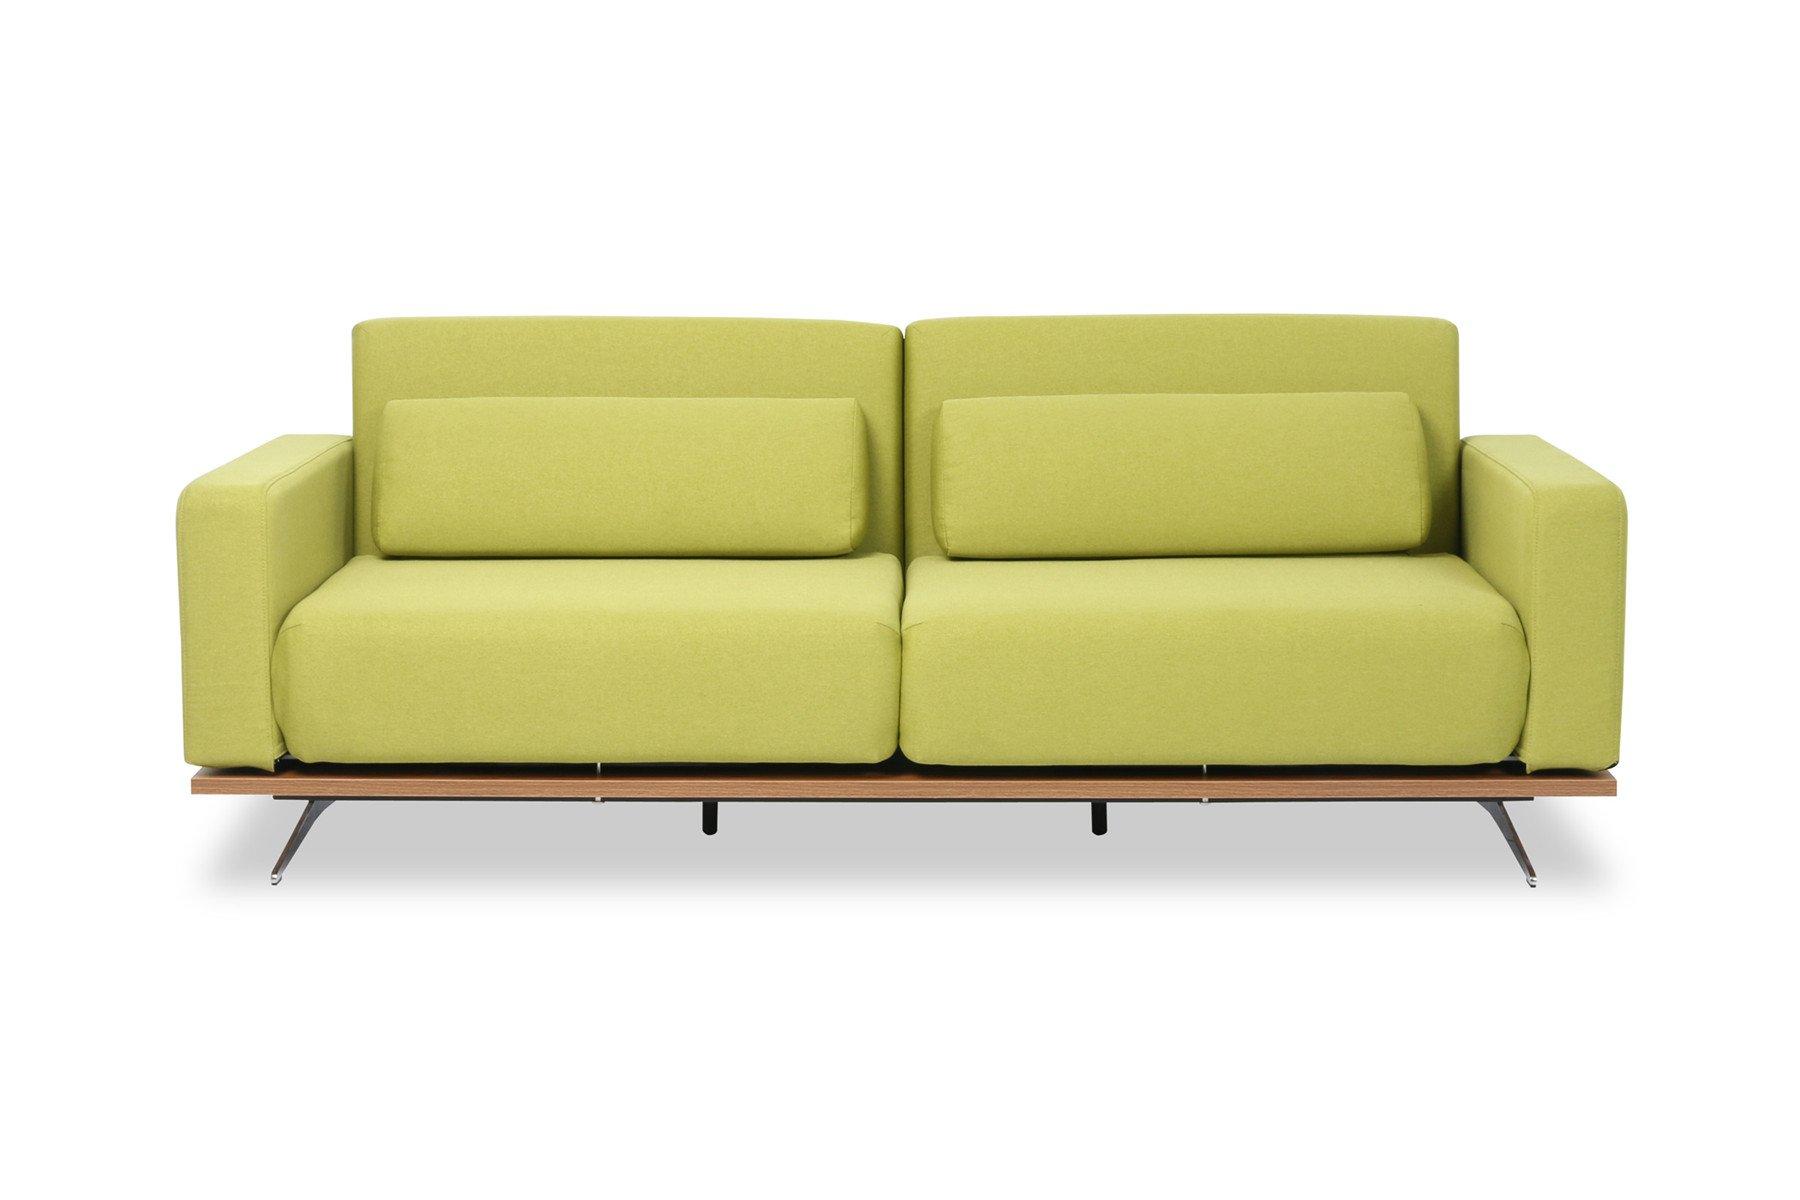 Full Size of Mondo Sofa Group Srl 1 Agata Meble Bed Bertinoro Leder Brick Online Kaufen Couch Softline Erfahrungen 3 Capocolle Modern Spaze Furniture Weiches Abnehmbarer Sofa Mondo Sofa